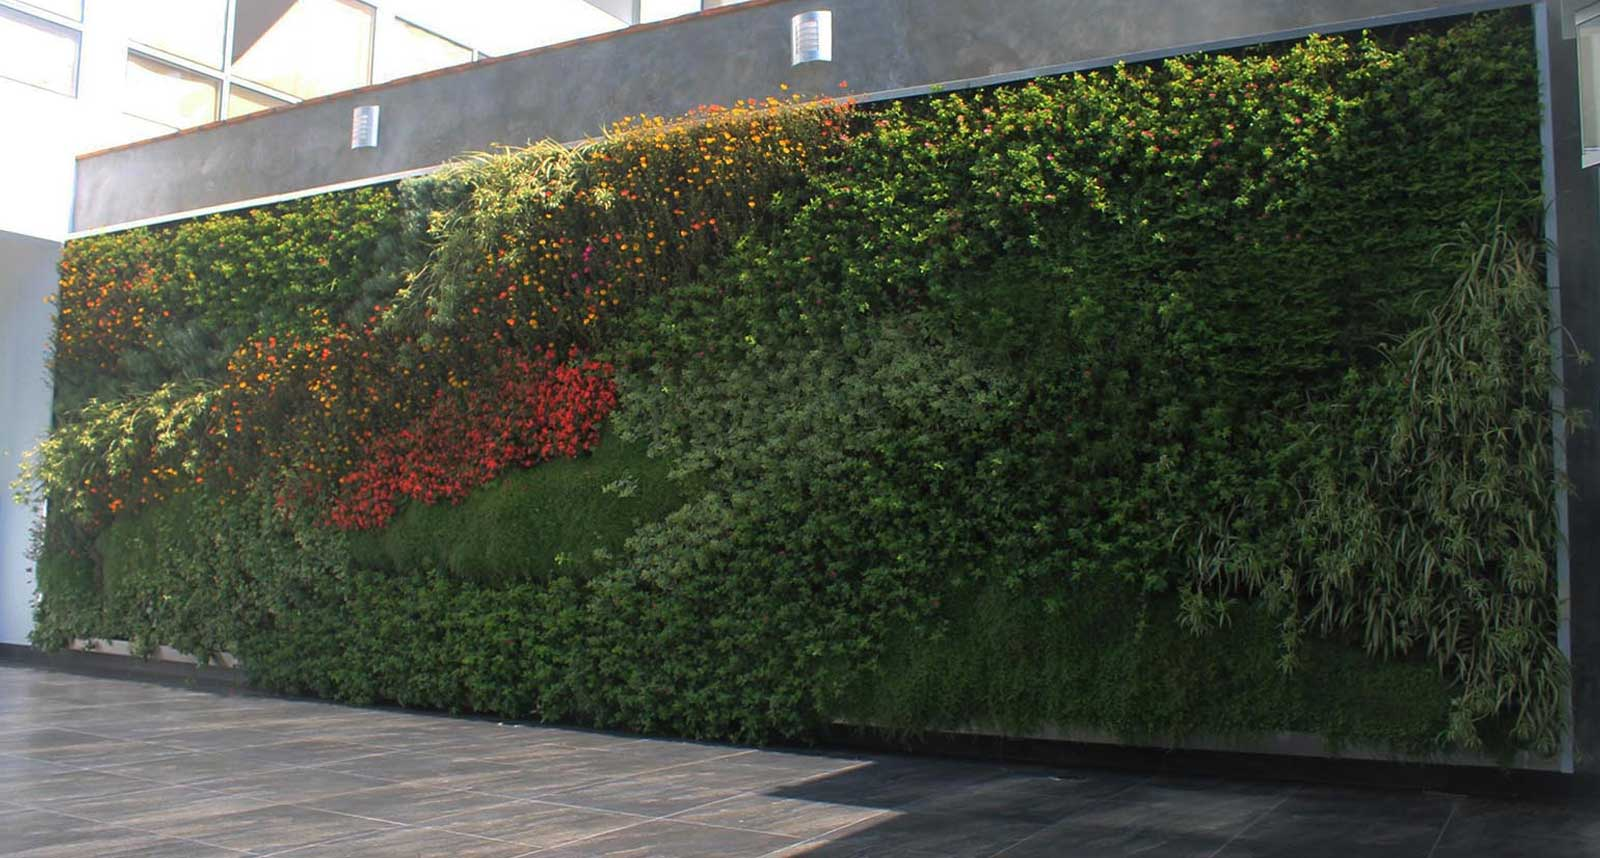 Conceptoverdevertical jard n vertical jardines verticales for Jardines verticales concepto